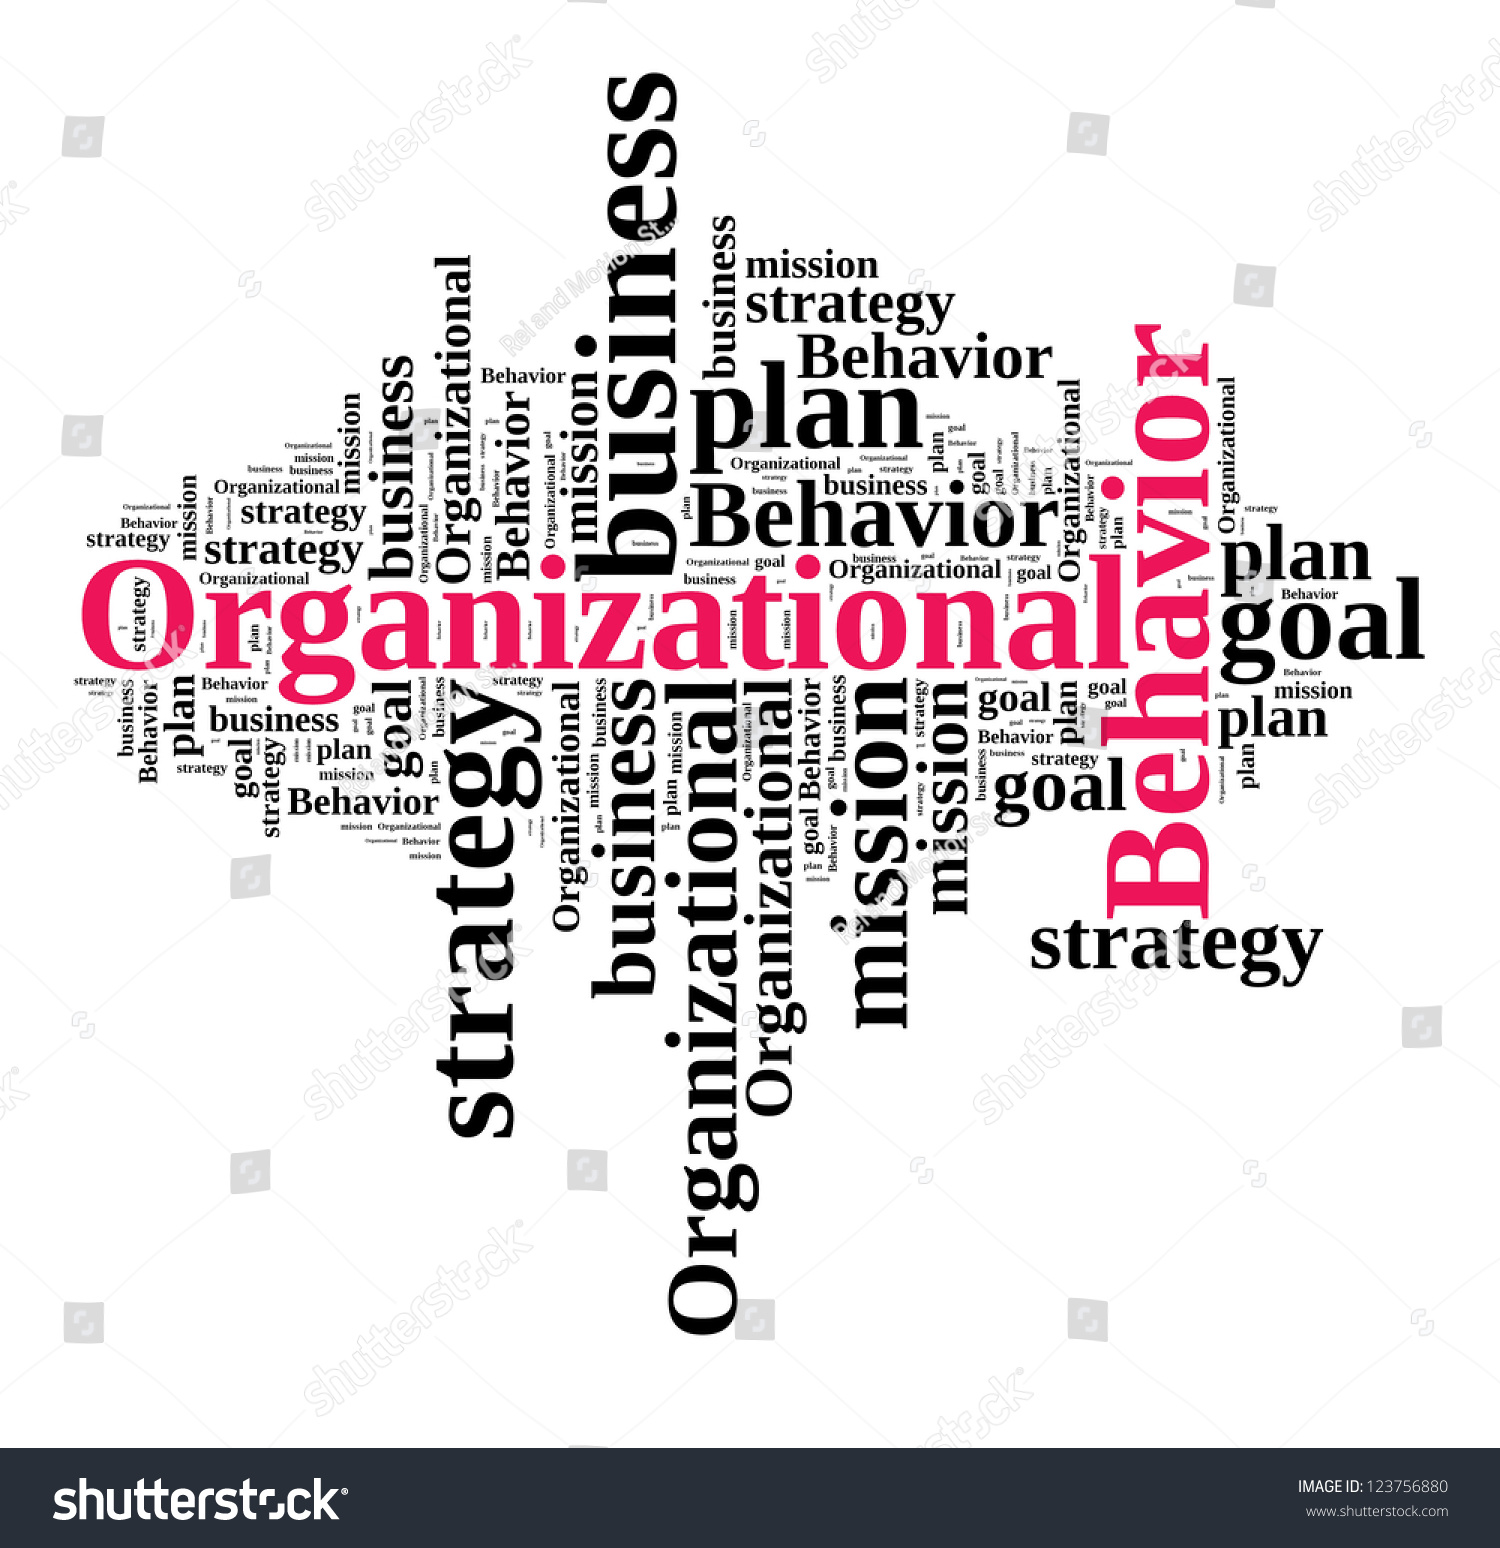 Dissertation Organizational Behavior